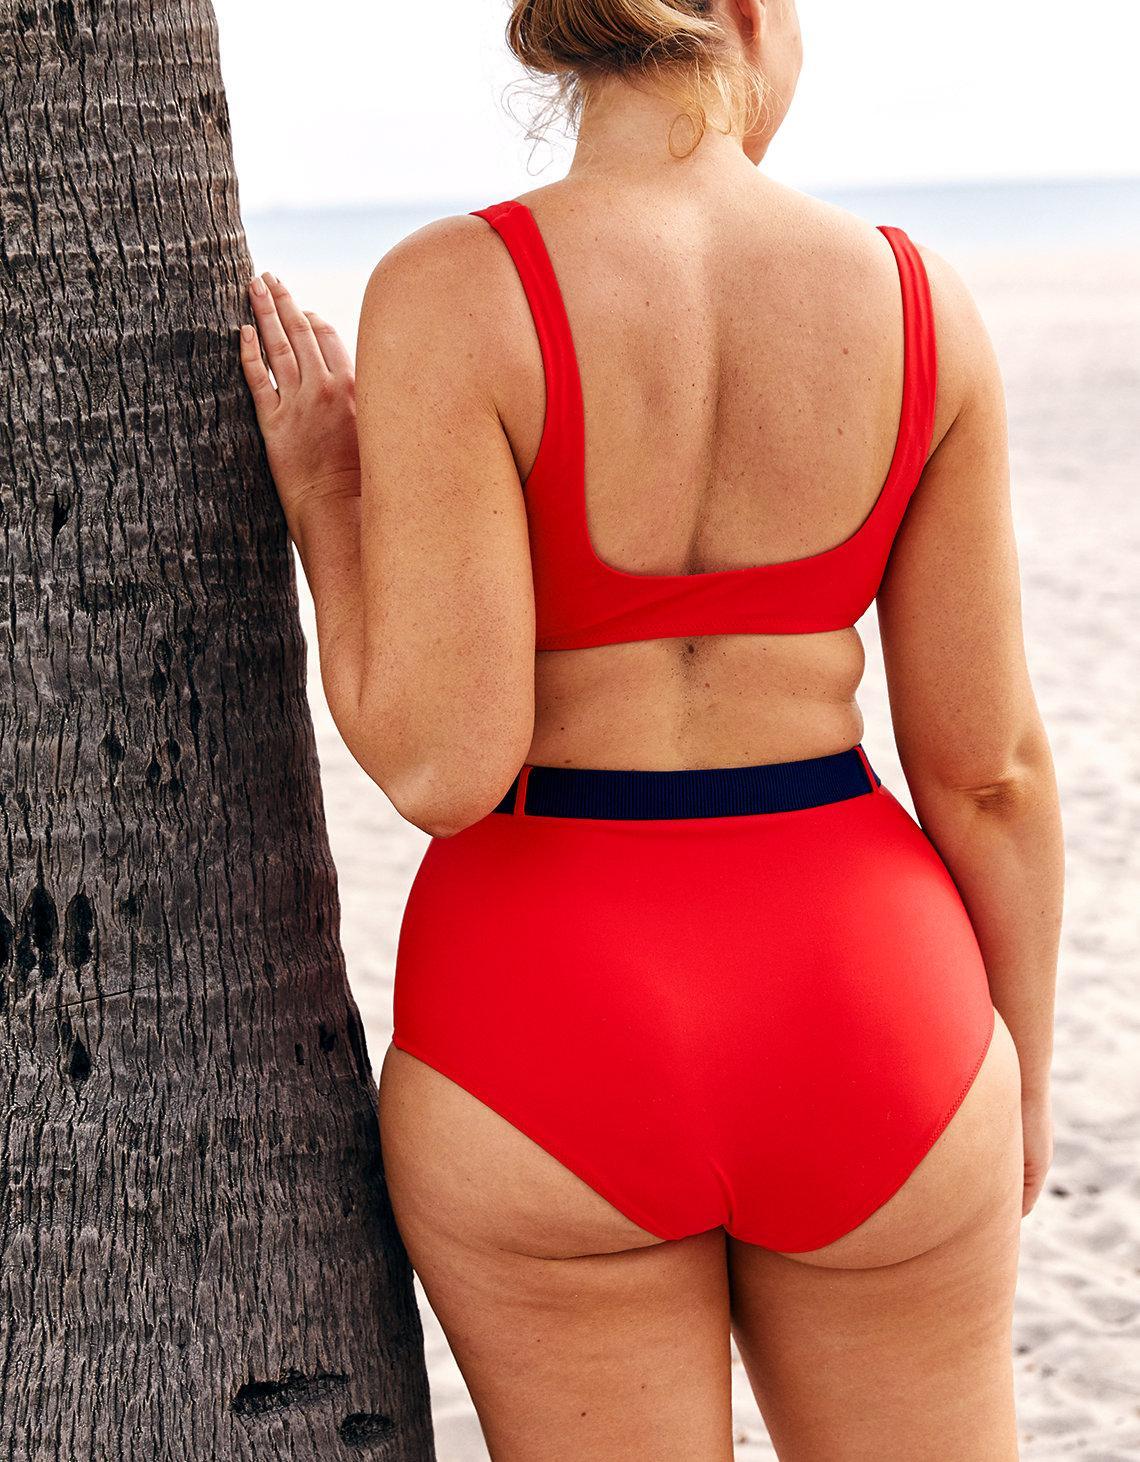 b1e1d6c9a5 American Eagle High Waisted Belted Bikini Bottom in Red - Lyst